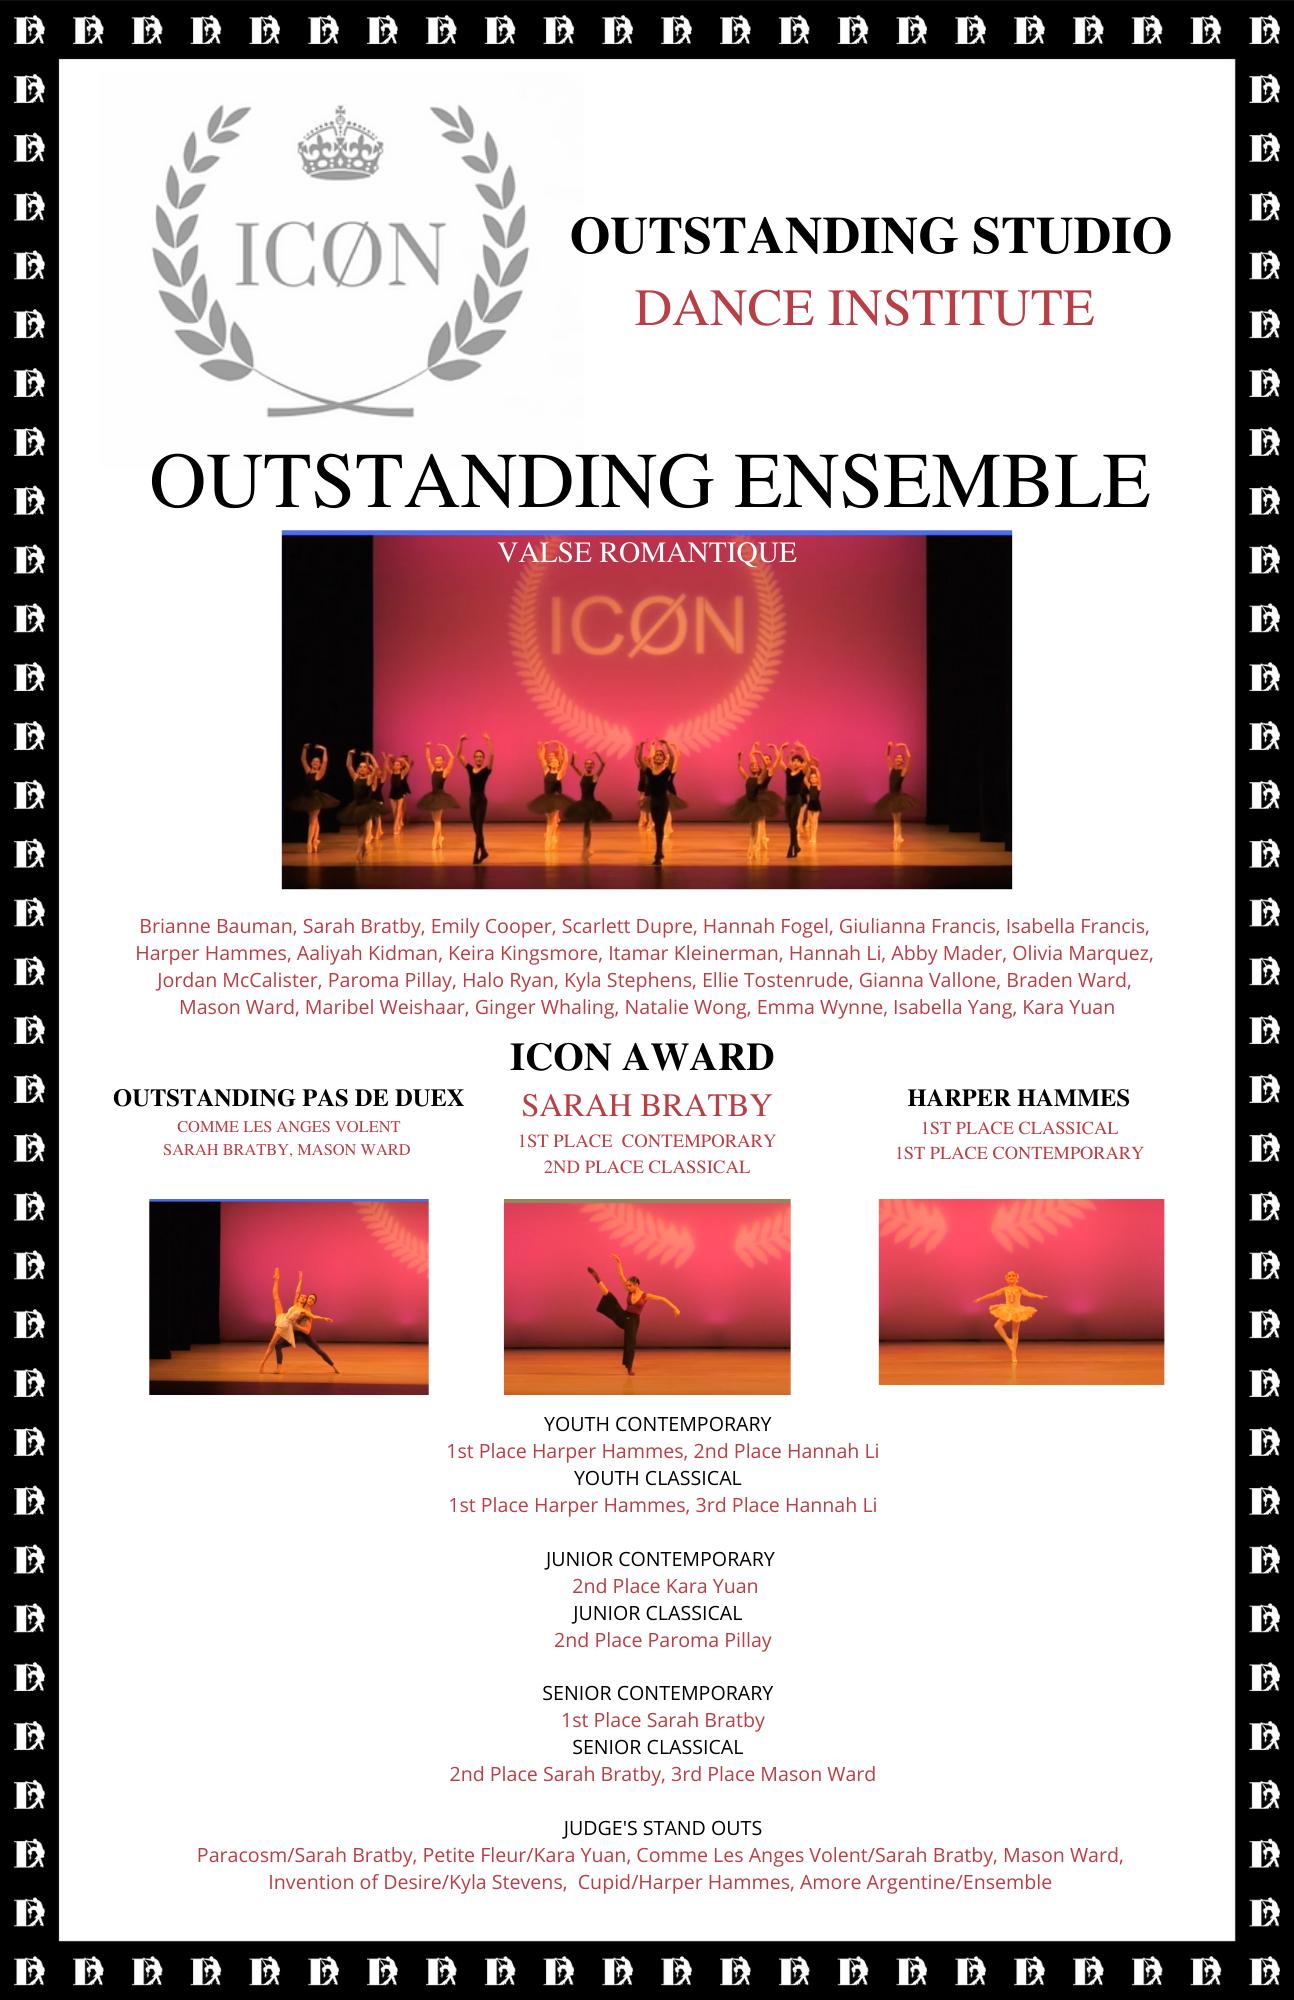 ICON OUTSTANDING STUDIO DANCE INSTITUTE.